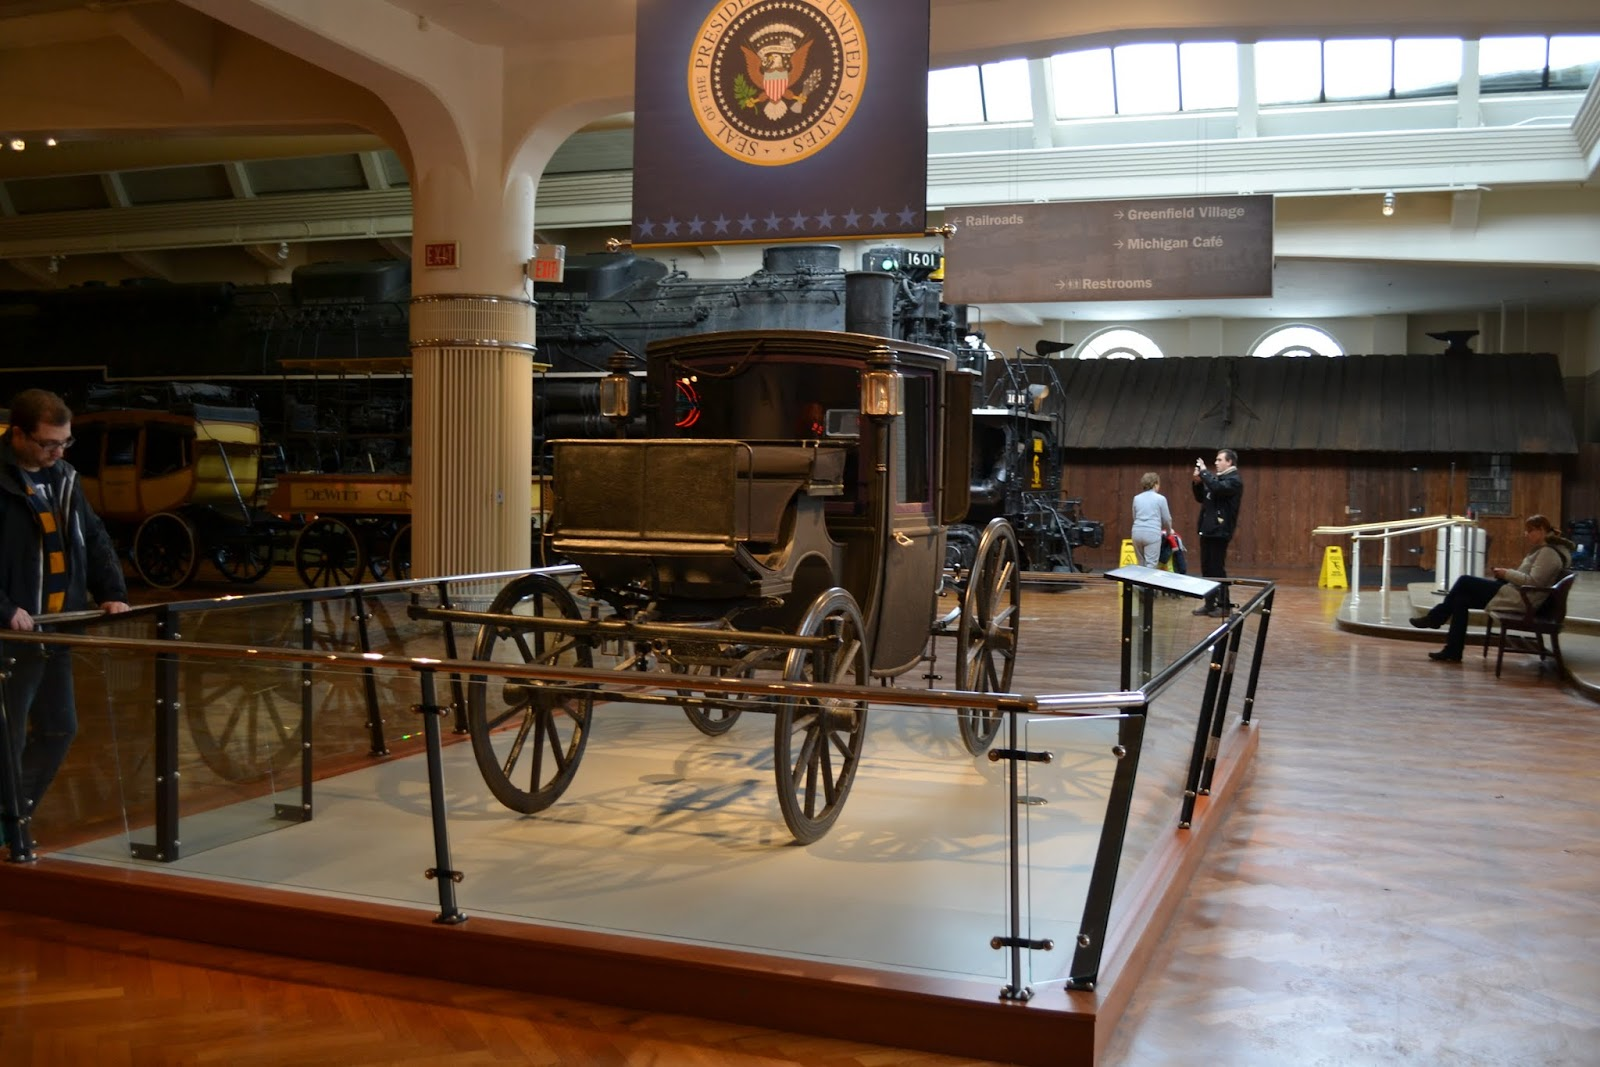 Музей Генри Форда - Автомобили Президентов США (Henry Ford Museum - Presidential Limousines)